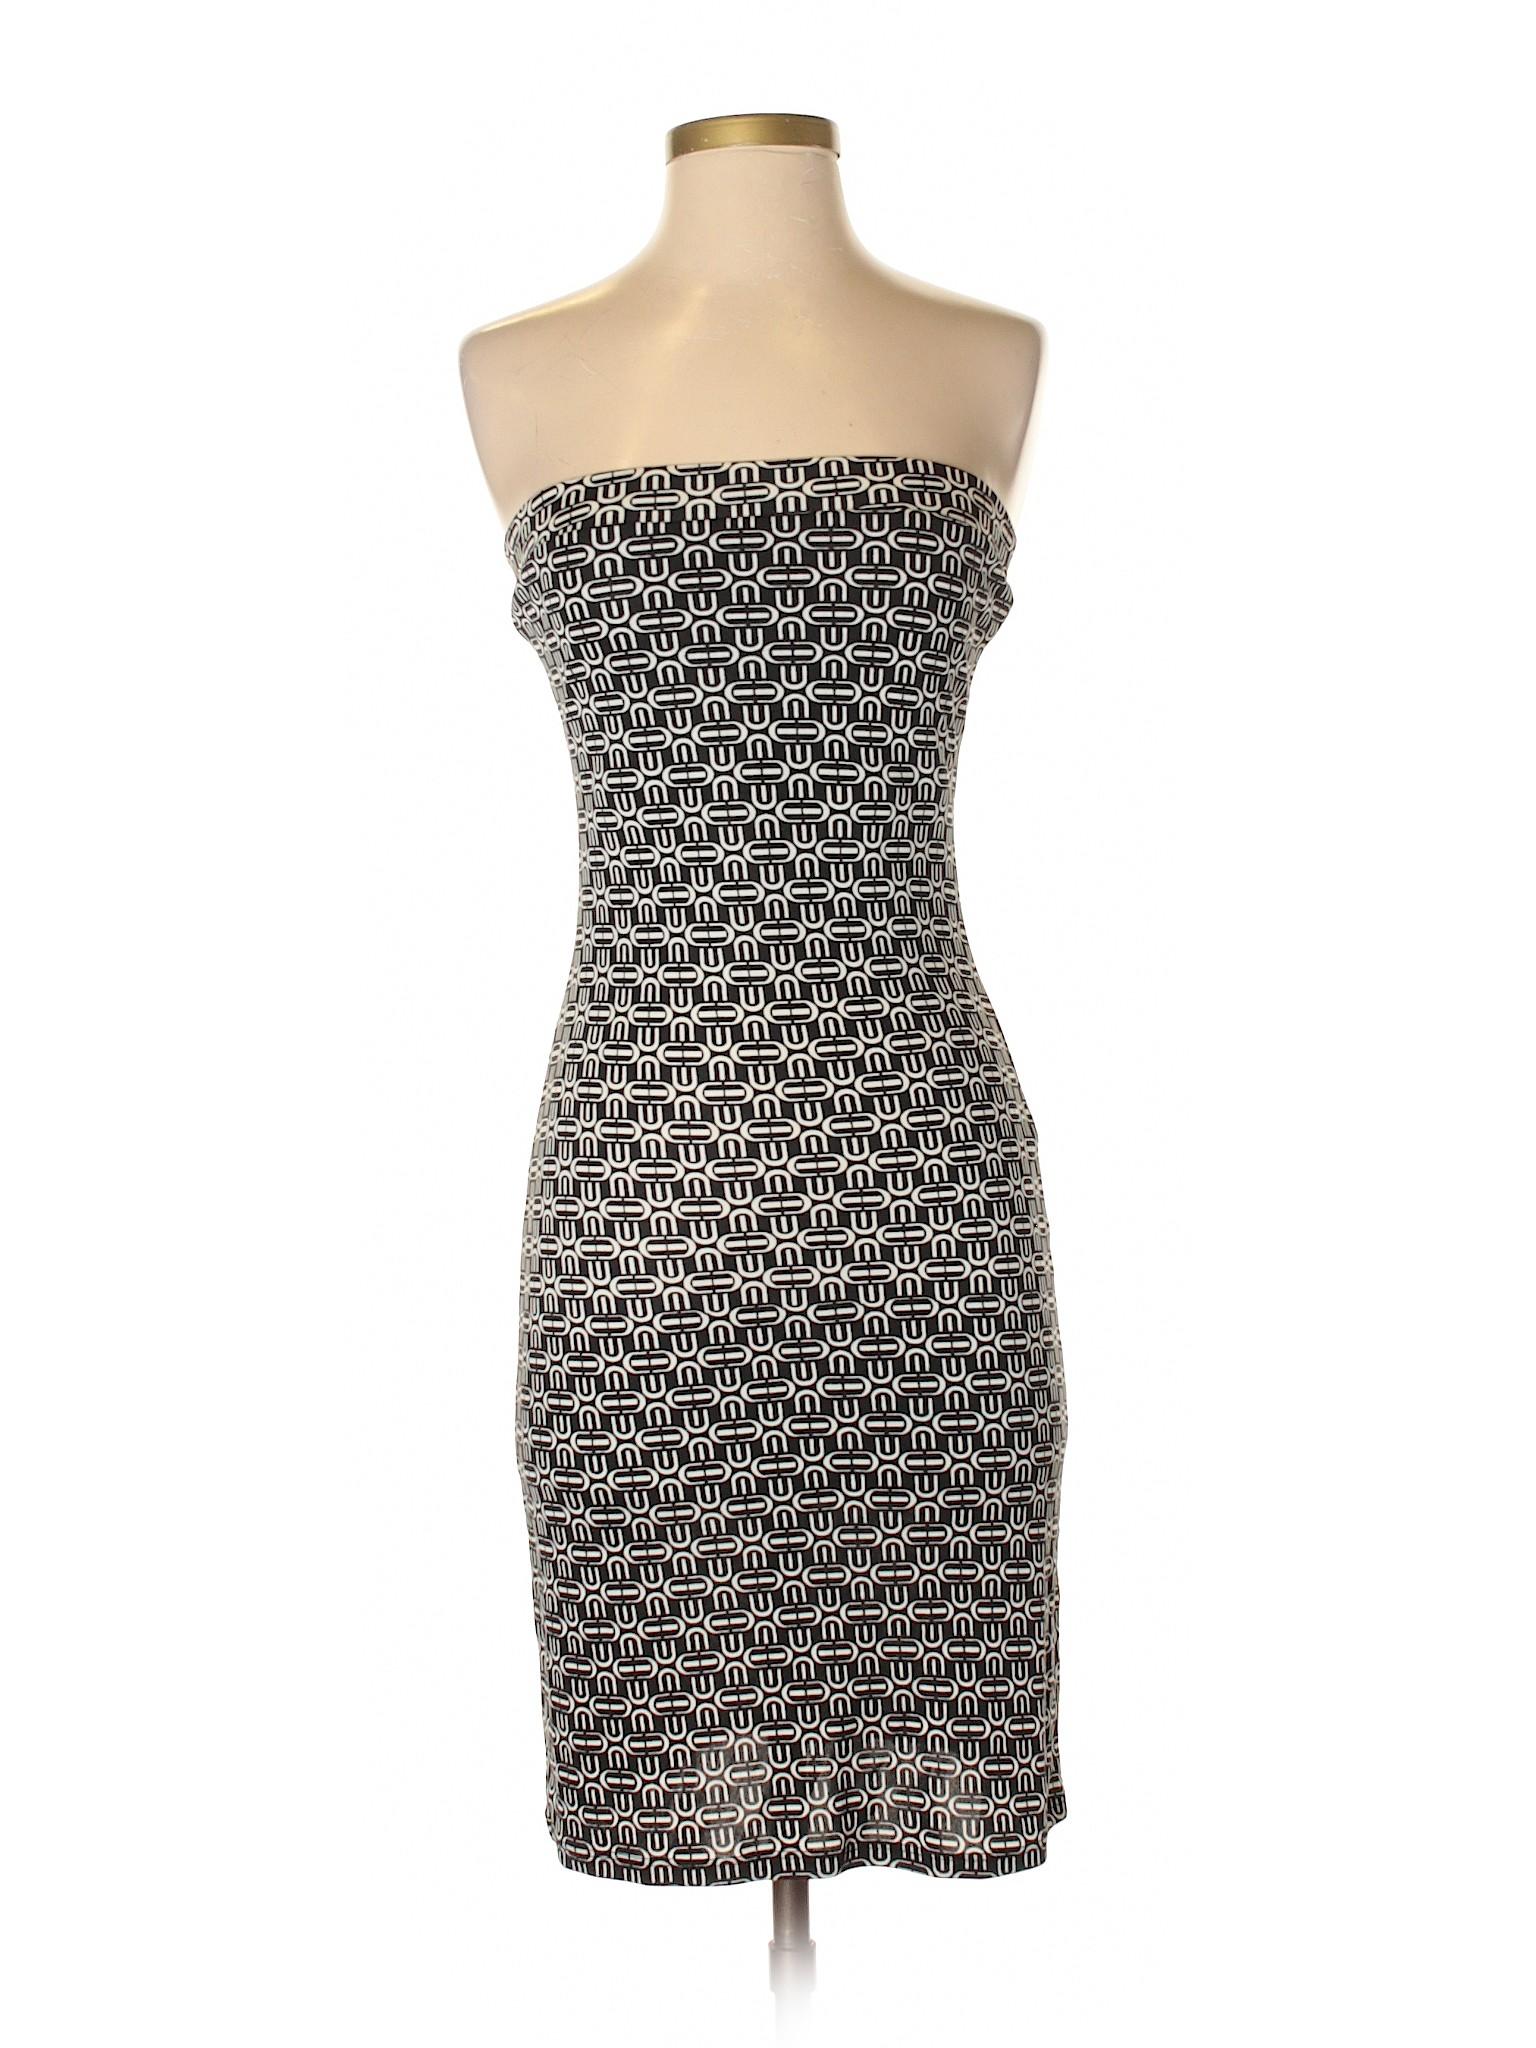 Bob Bob Bob Dress Hale Dress Hale Selling Selling Dress Casual Selling Casual Hale Hale Selling Casual gqYpg